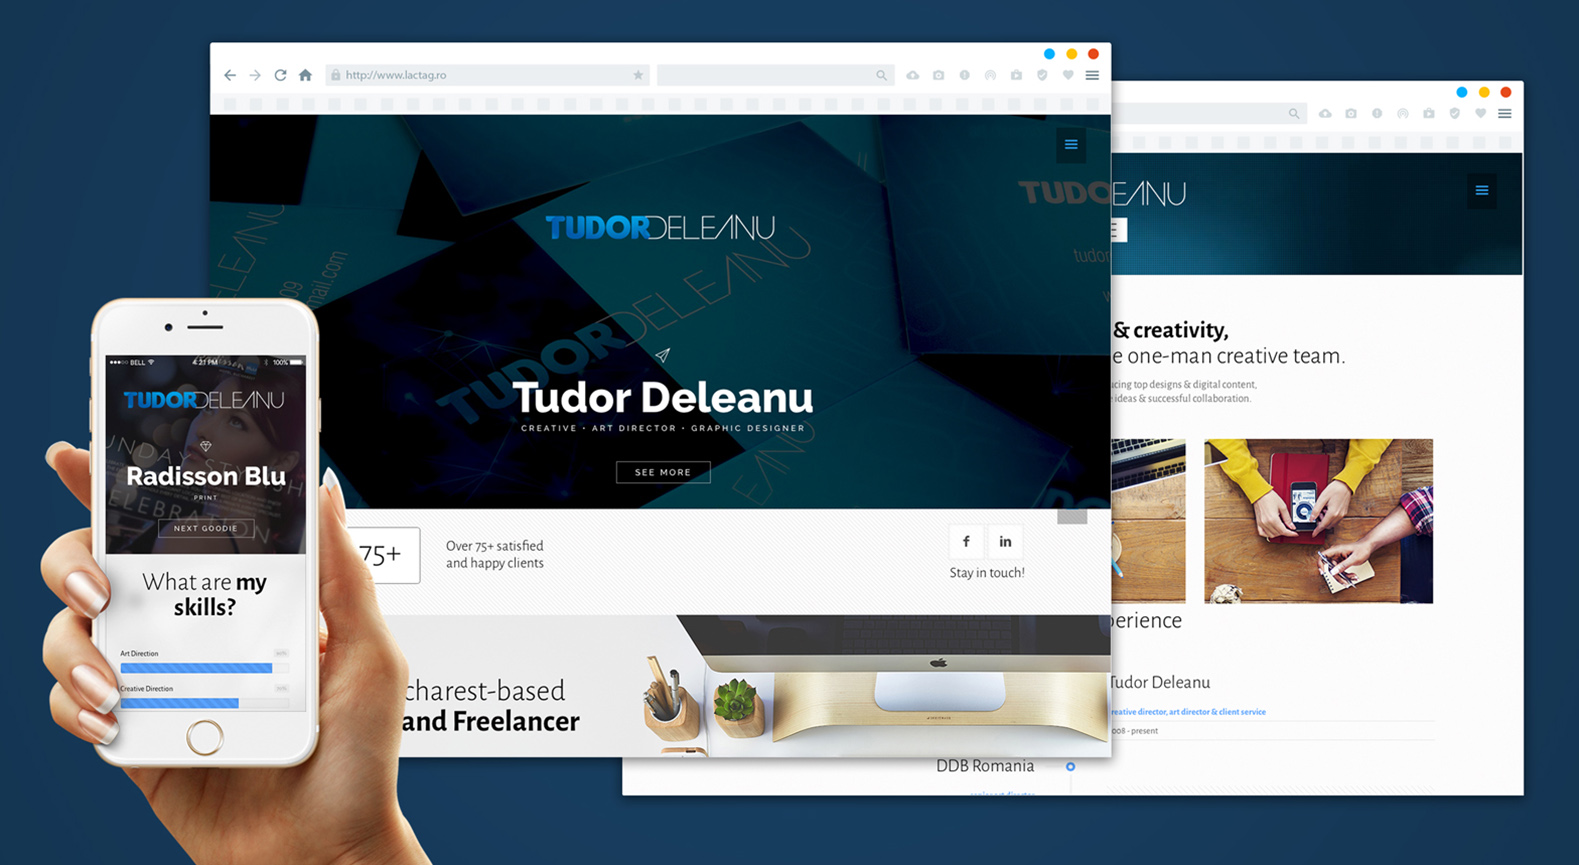 tudor_deleanu_creative_design_art_advertising_web_website__0004_Tudor